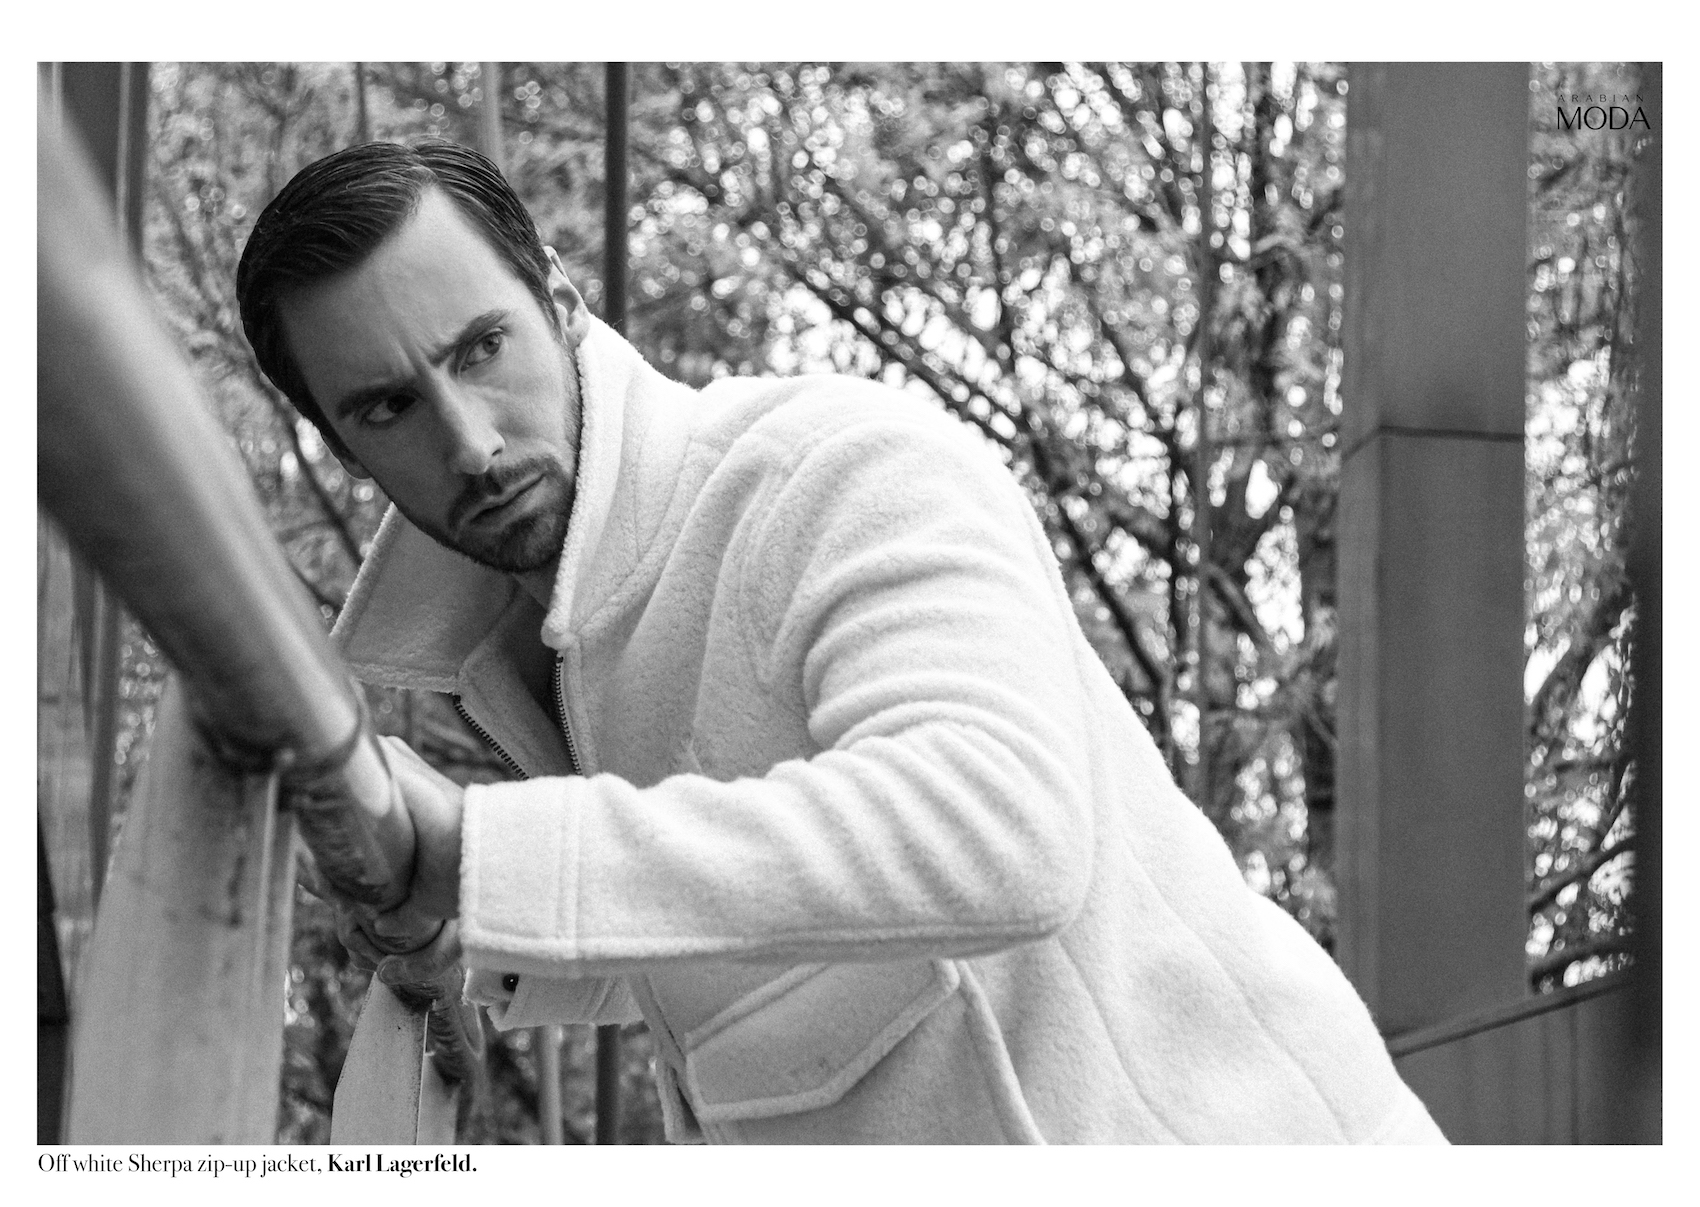 Arabian Moda x Karl Lagerfeld